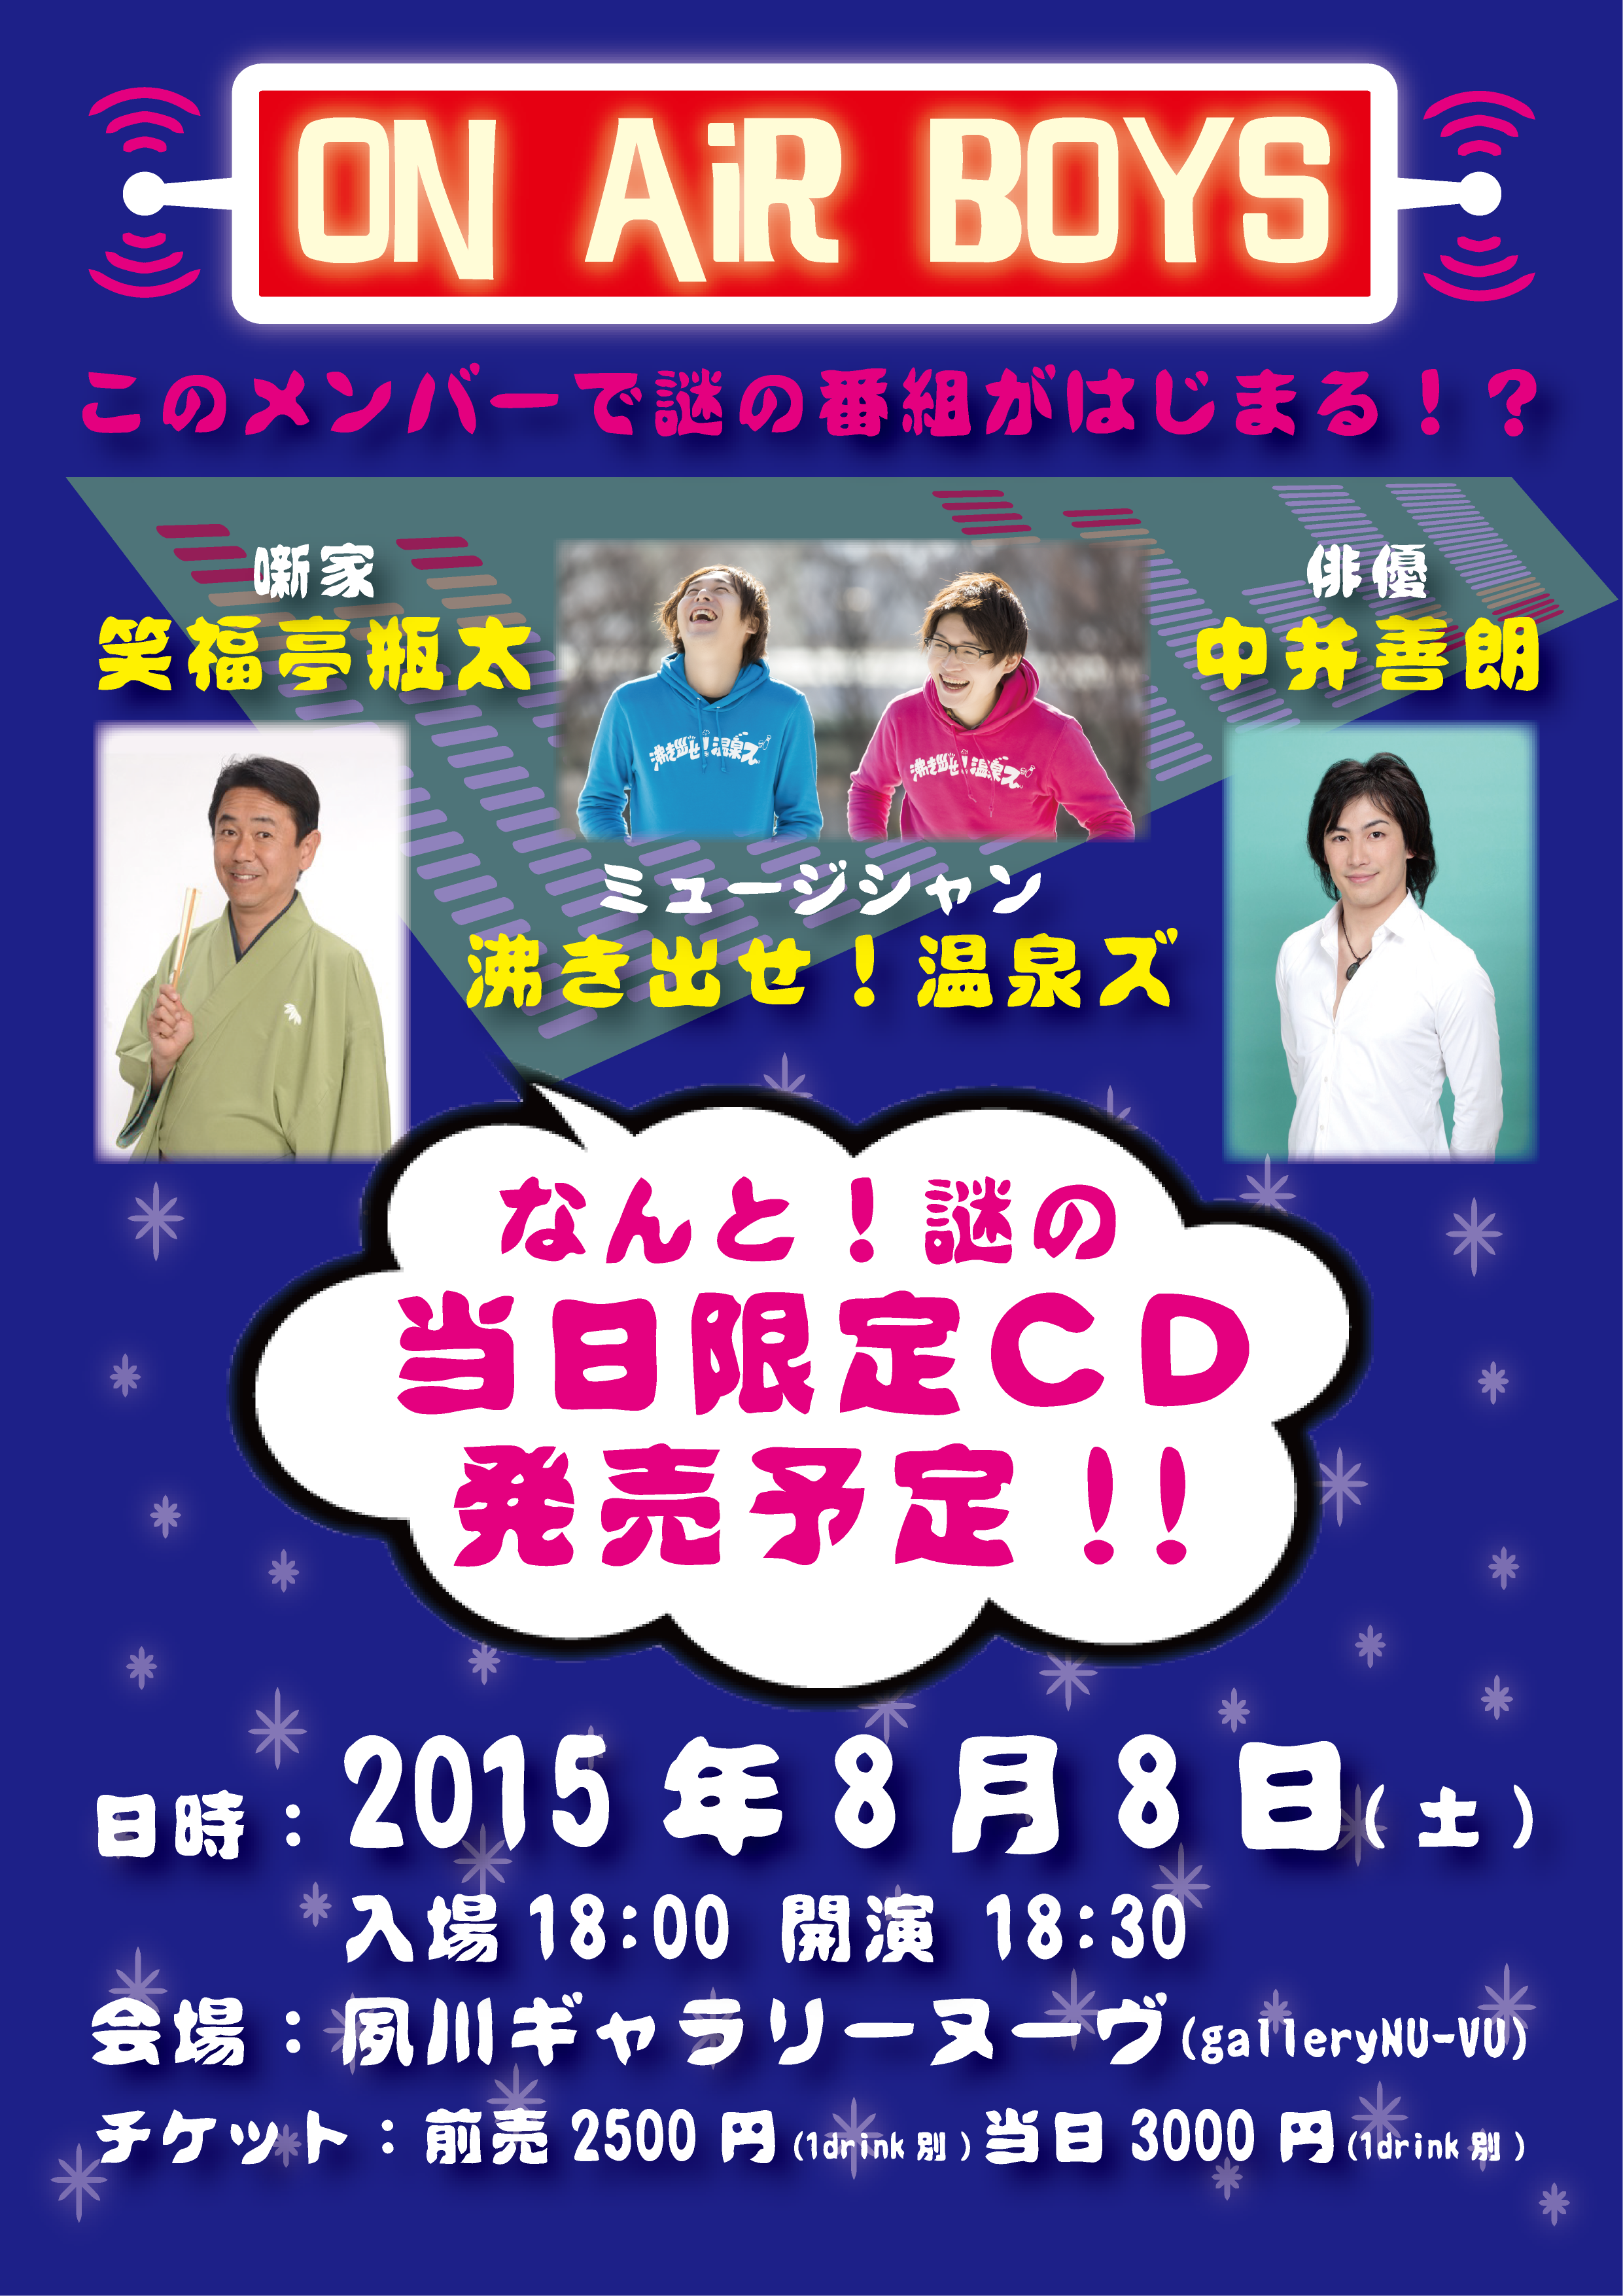 2015.08.08『ON AIR BOYS』@夙川NU-VU(兵庫):2015.05.08